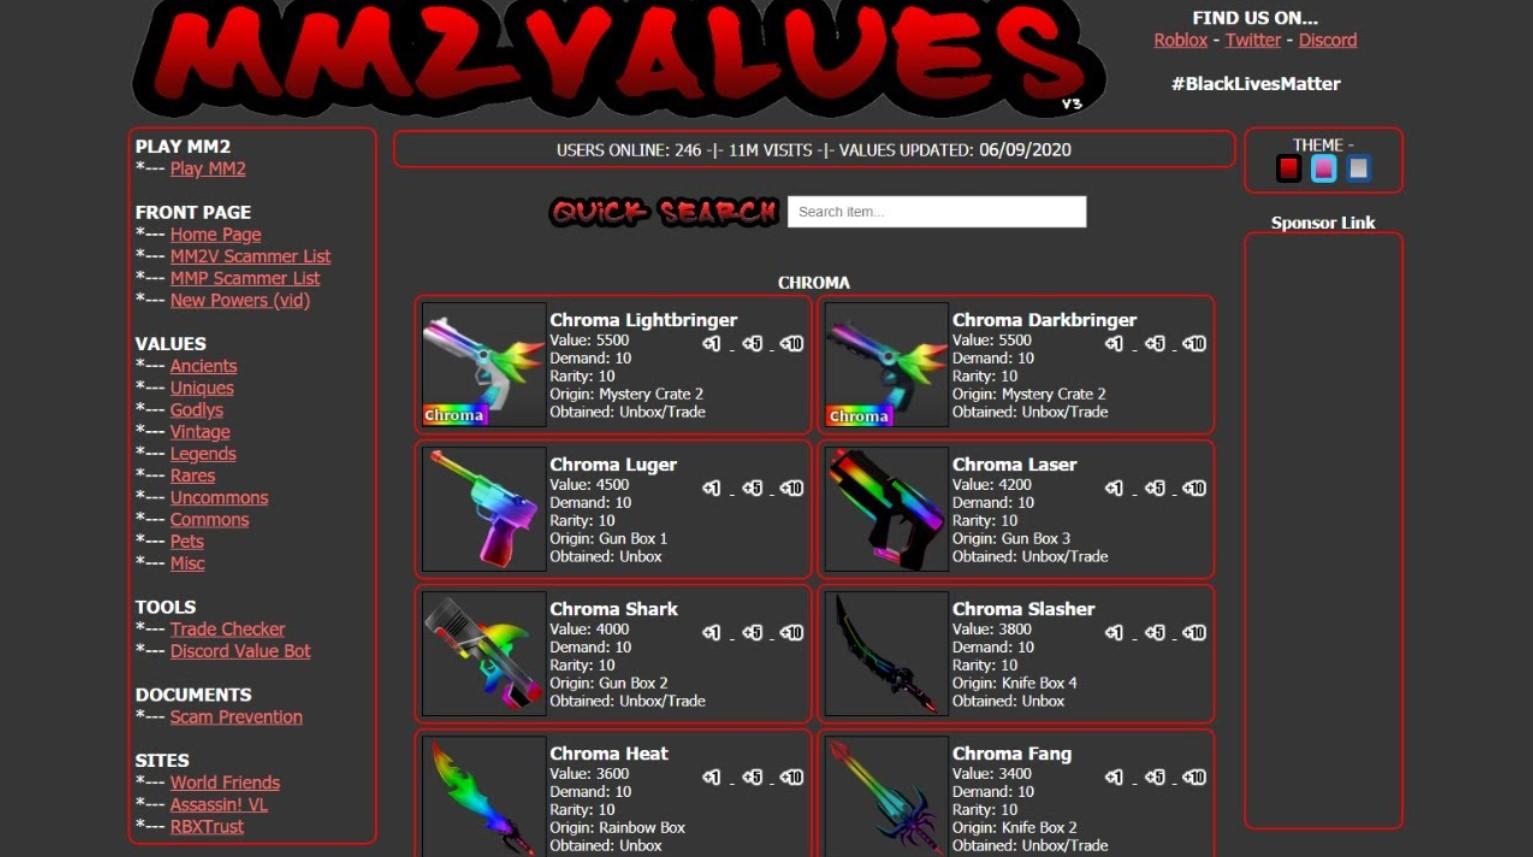 Murder Mystery 2 Values